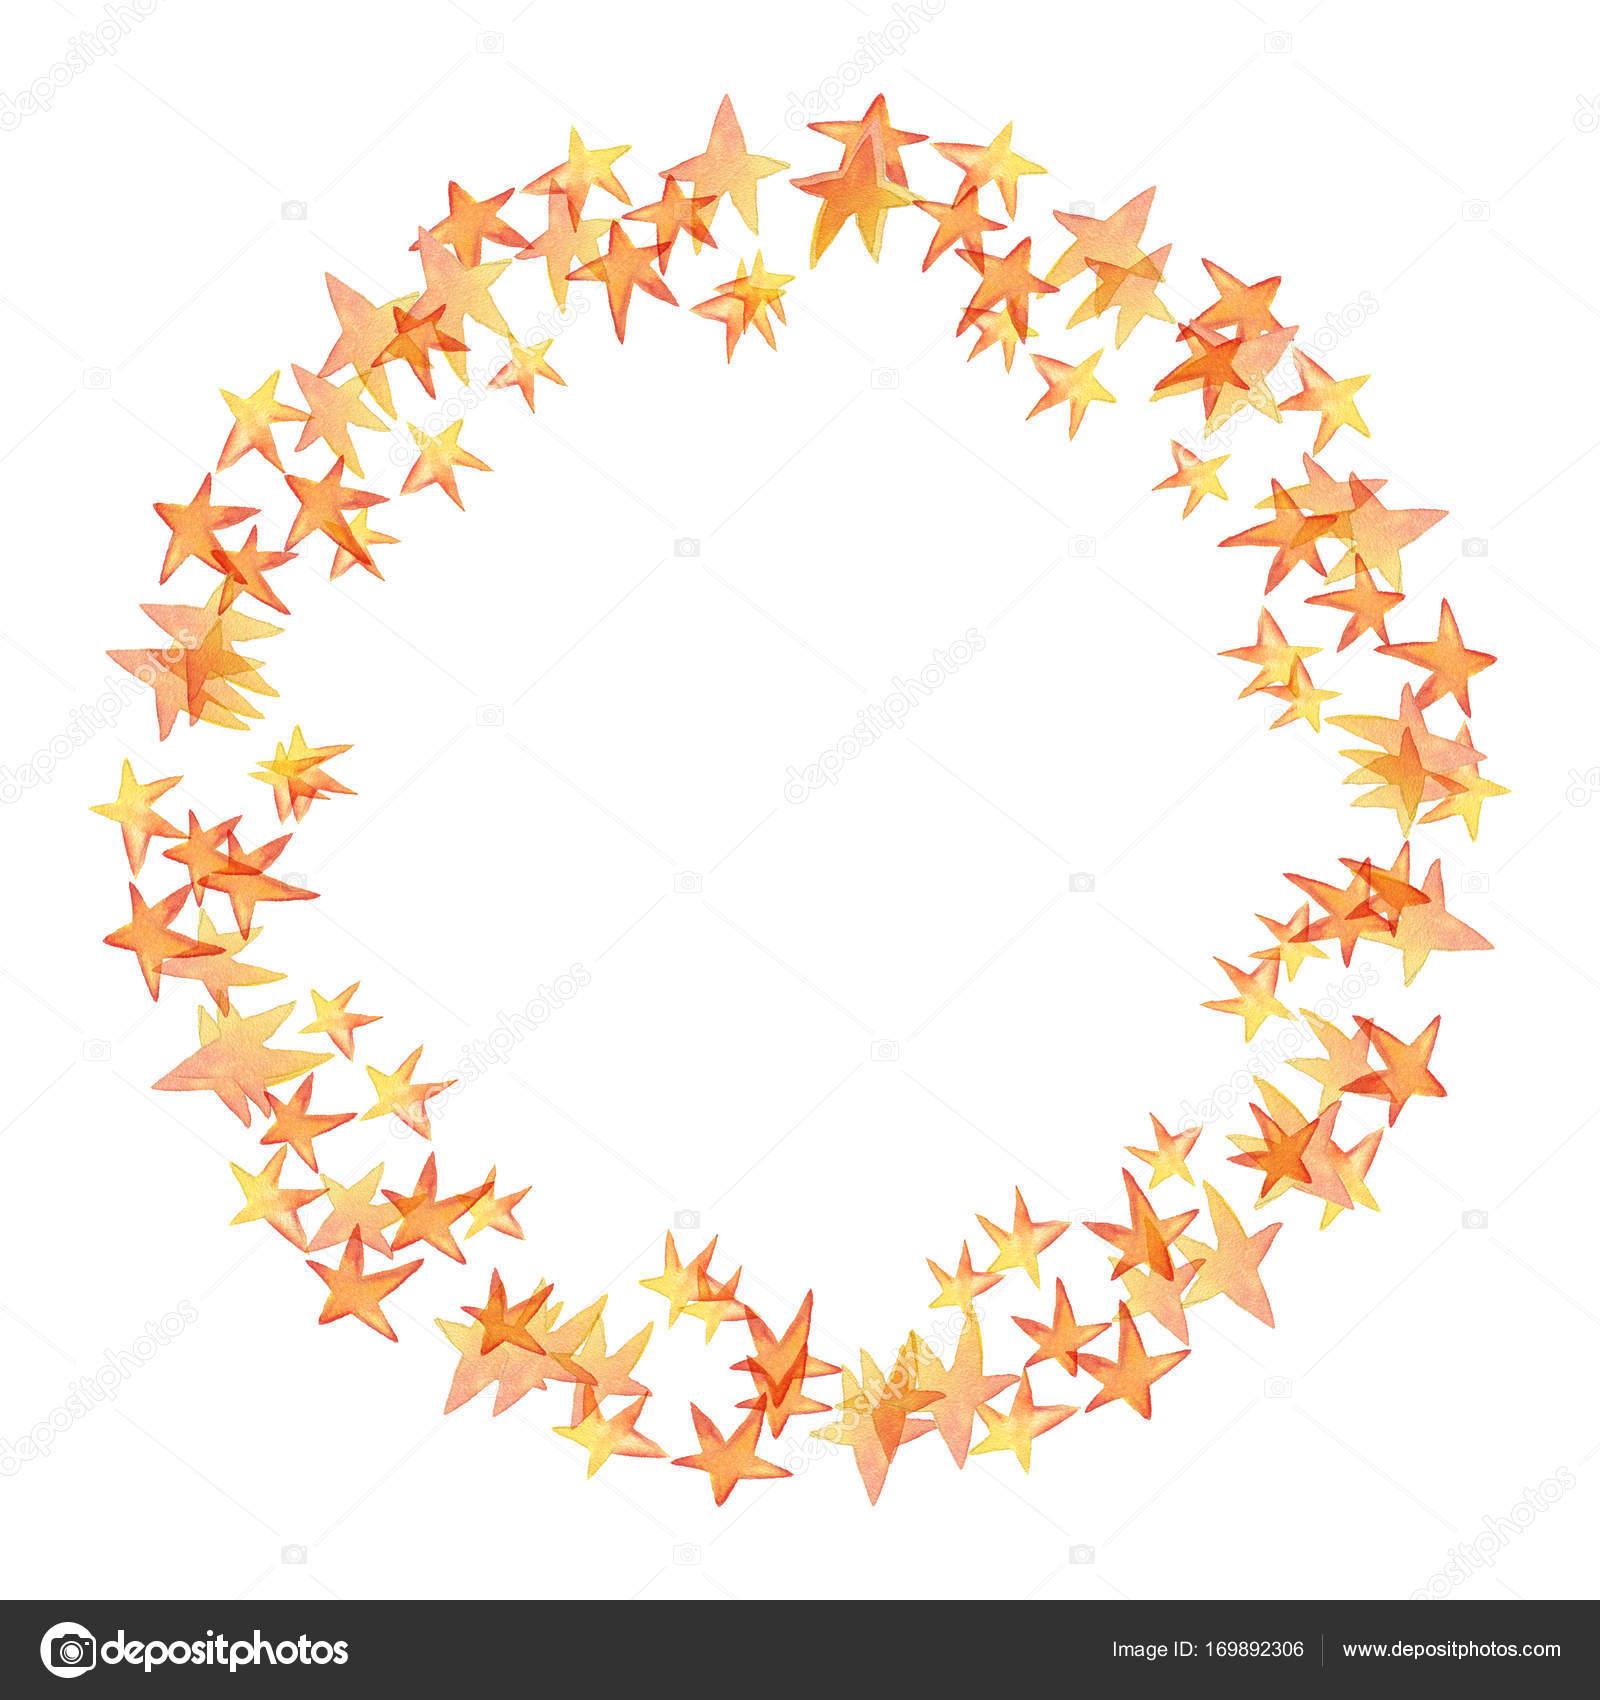 Kranz, Rahmen. Aquarell Sterne — Stockfoto © likorbut #169892306